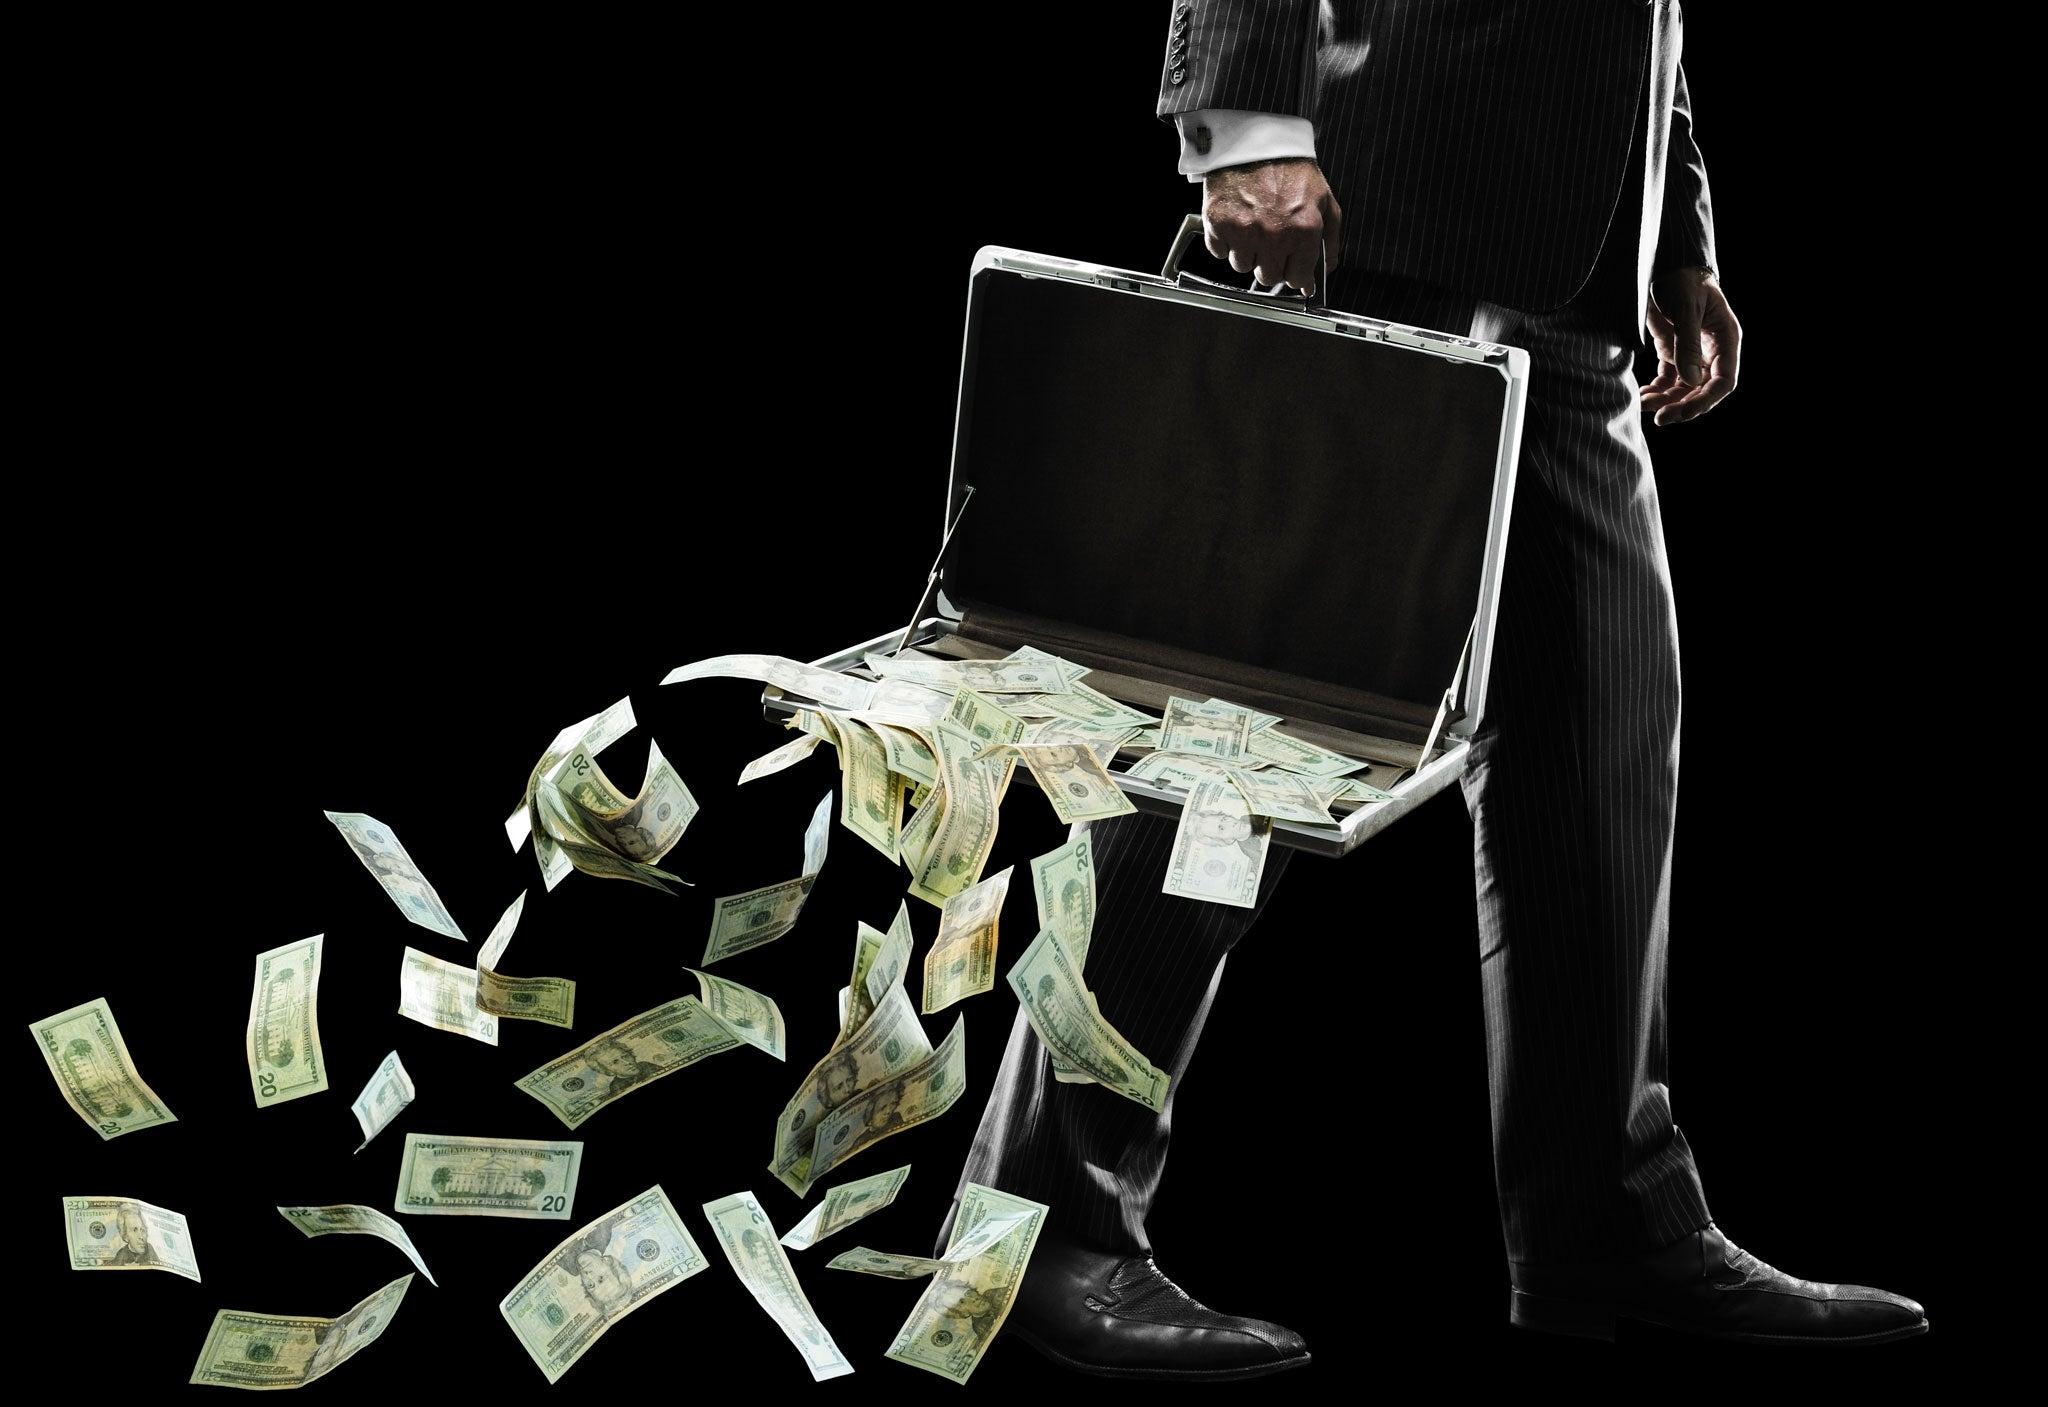 gunun en cok kaybettiren kripto para birimi 23 aralik 2020